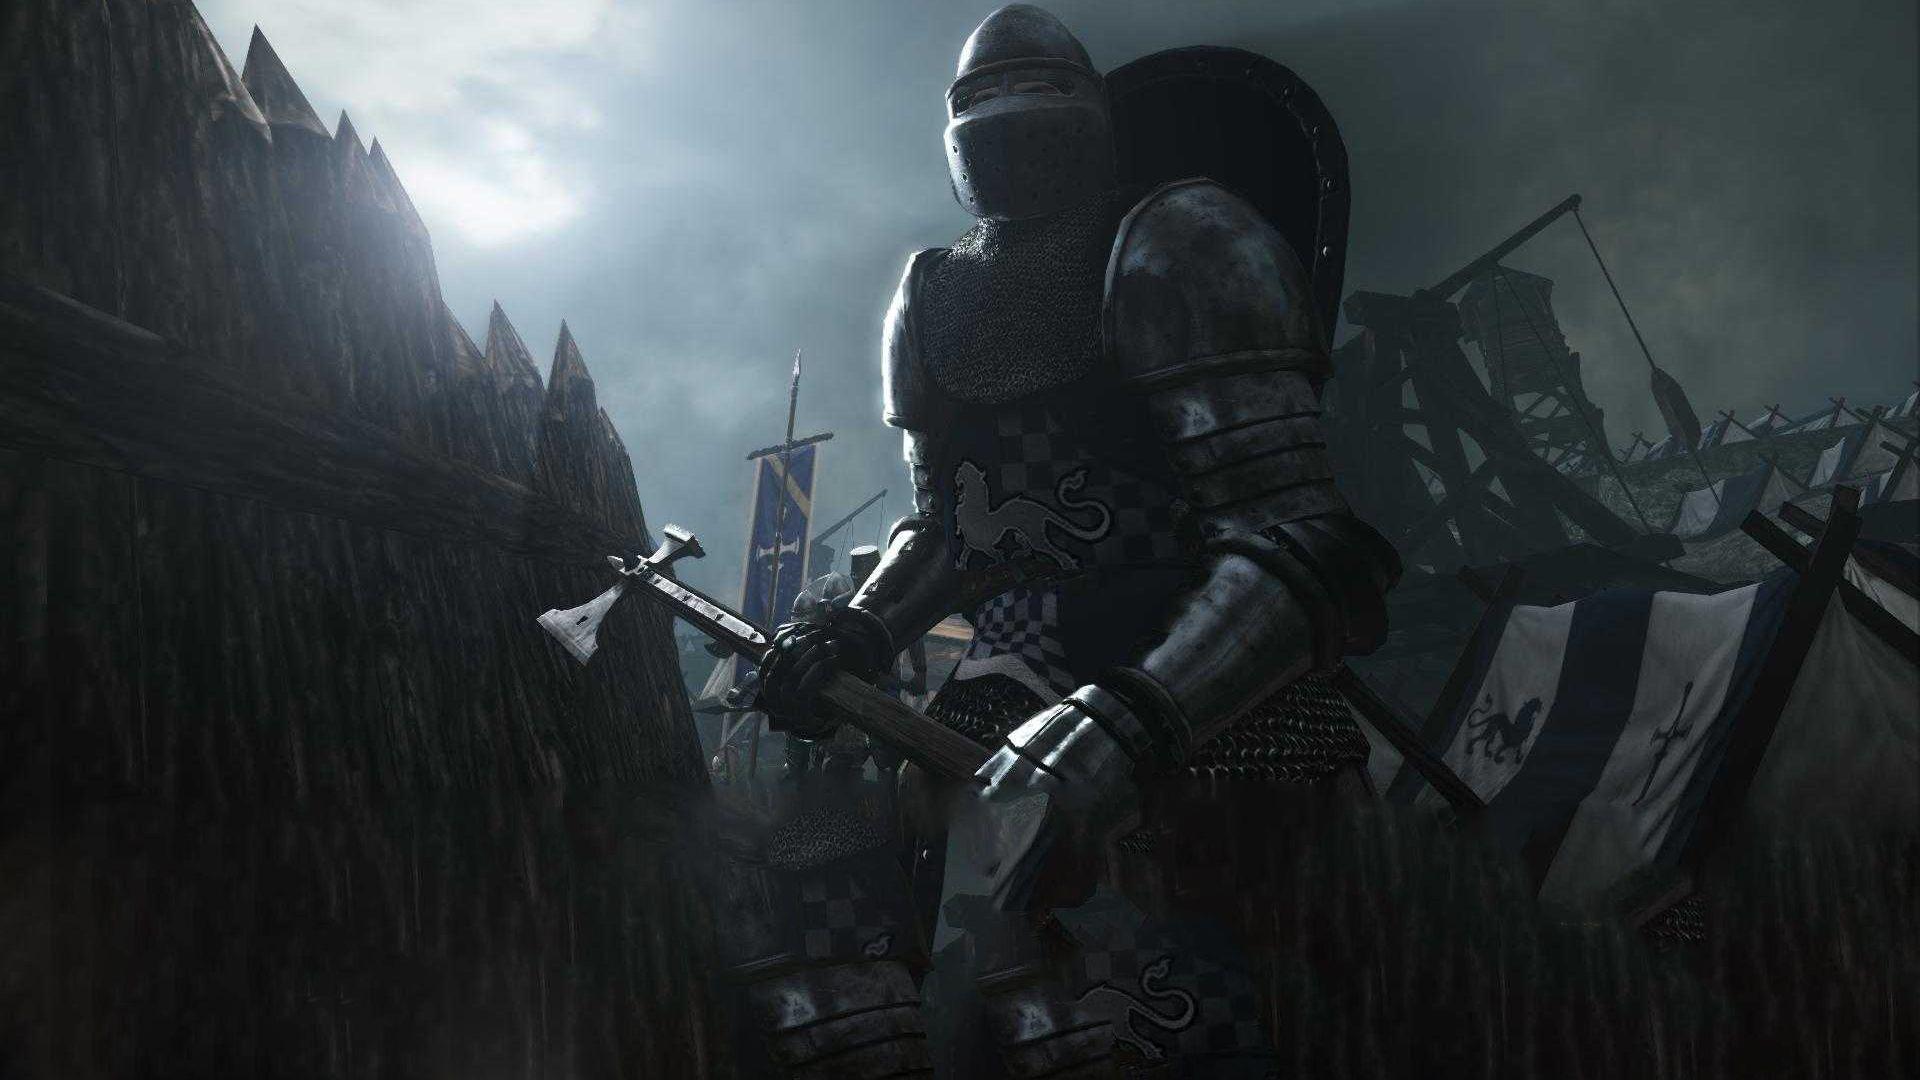 chivalry-medieval-warfare-pc-steam-cd-key-satin-al-durmaplay.jpg